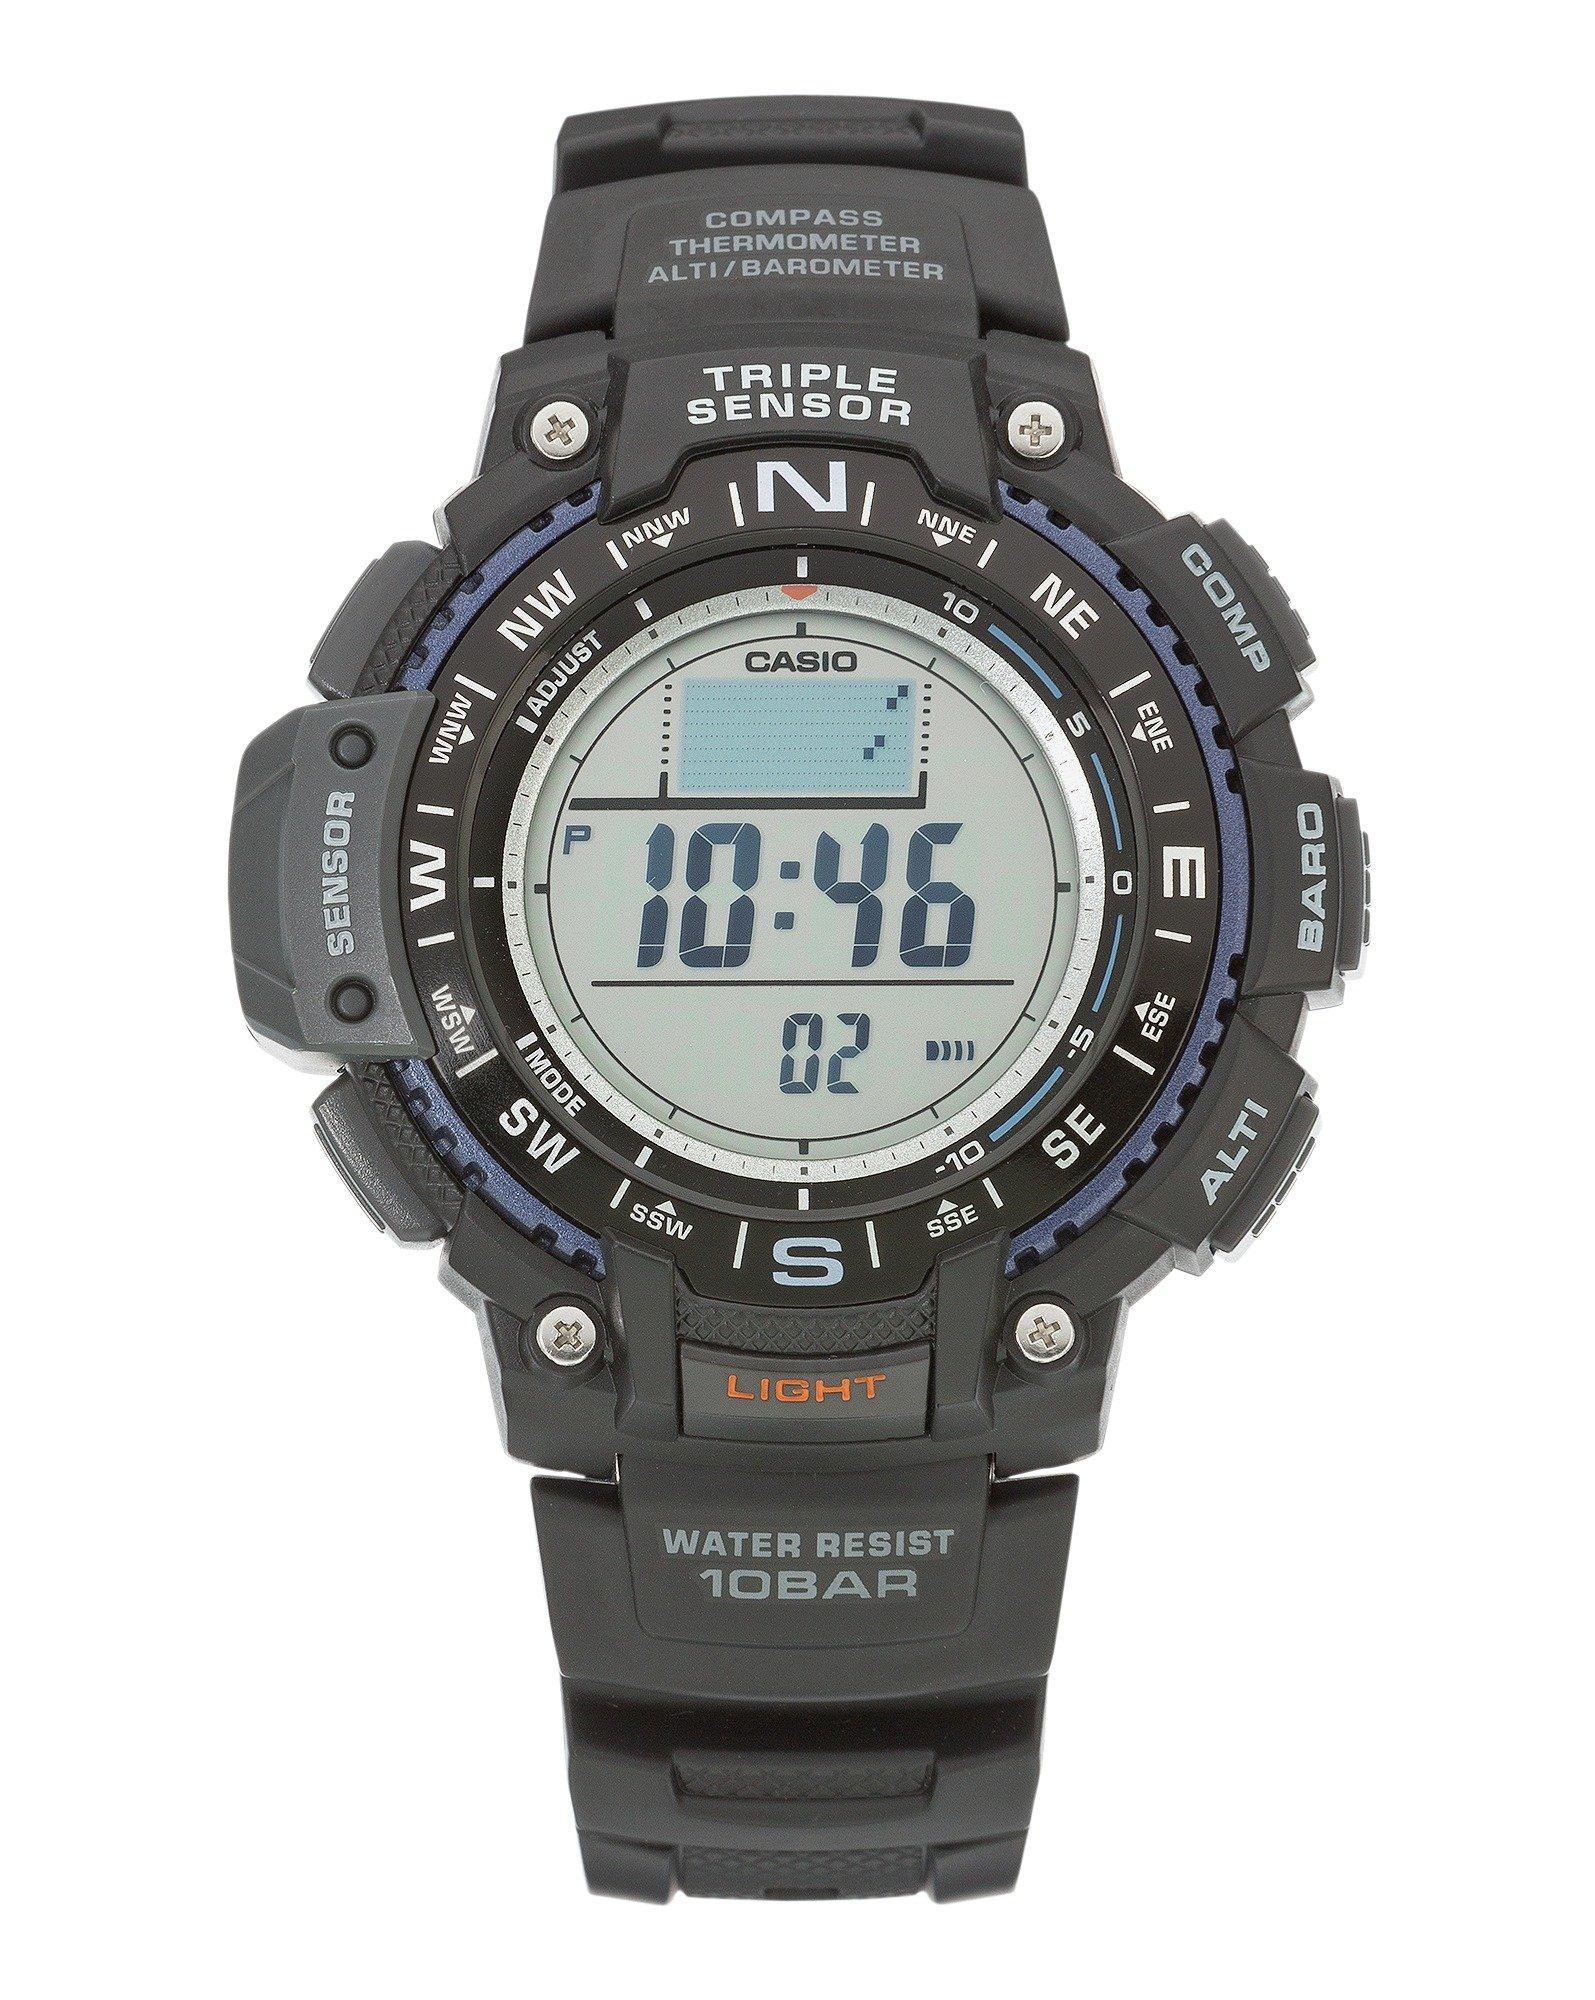 Casio - Sport - Mens Triple Sensor Digital Strap - Watch